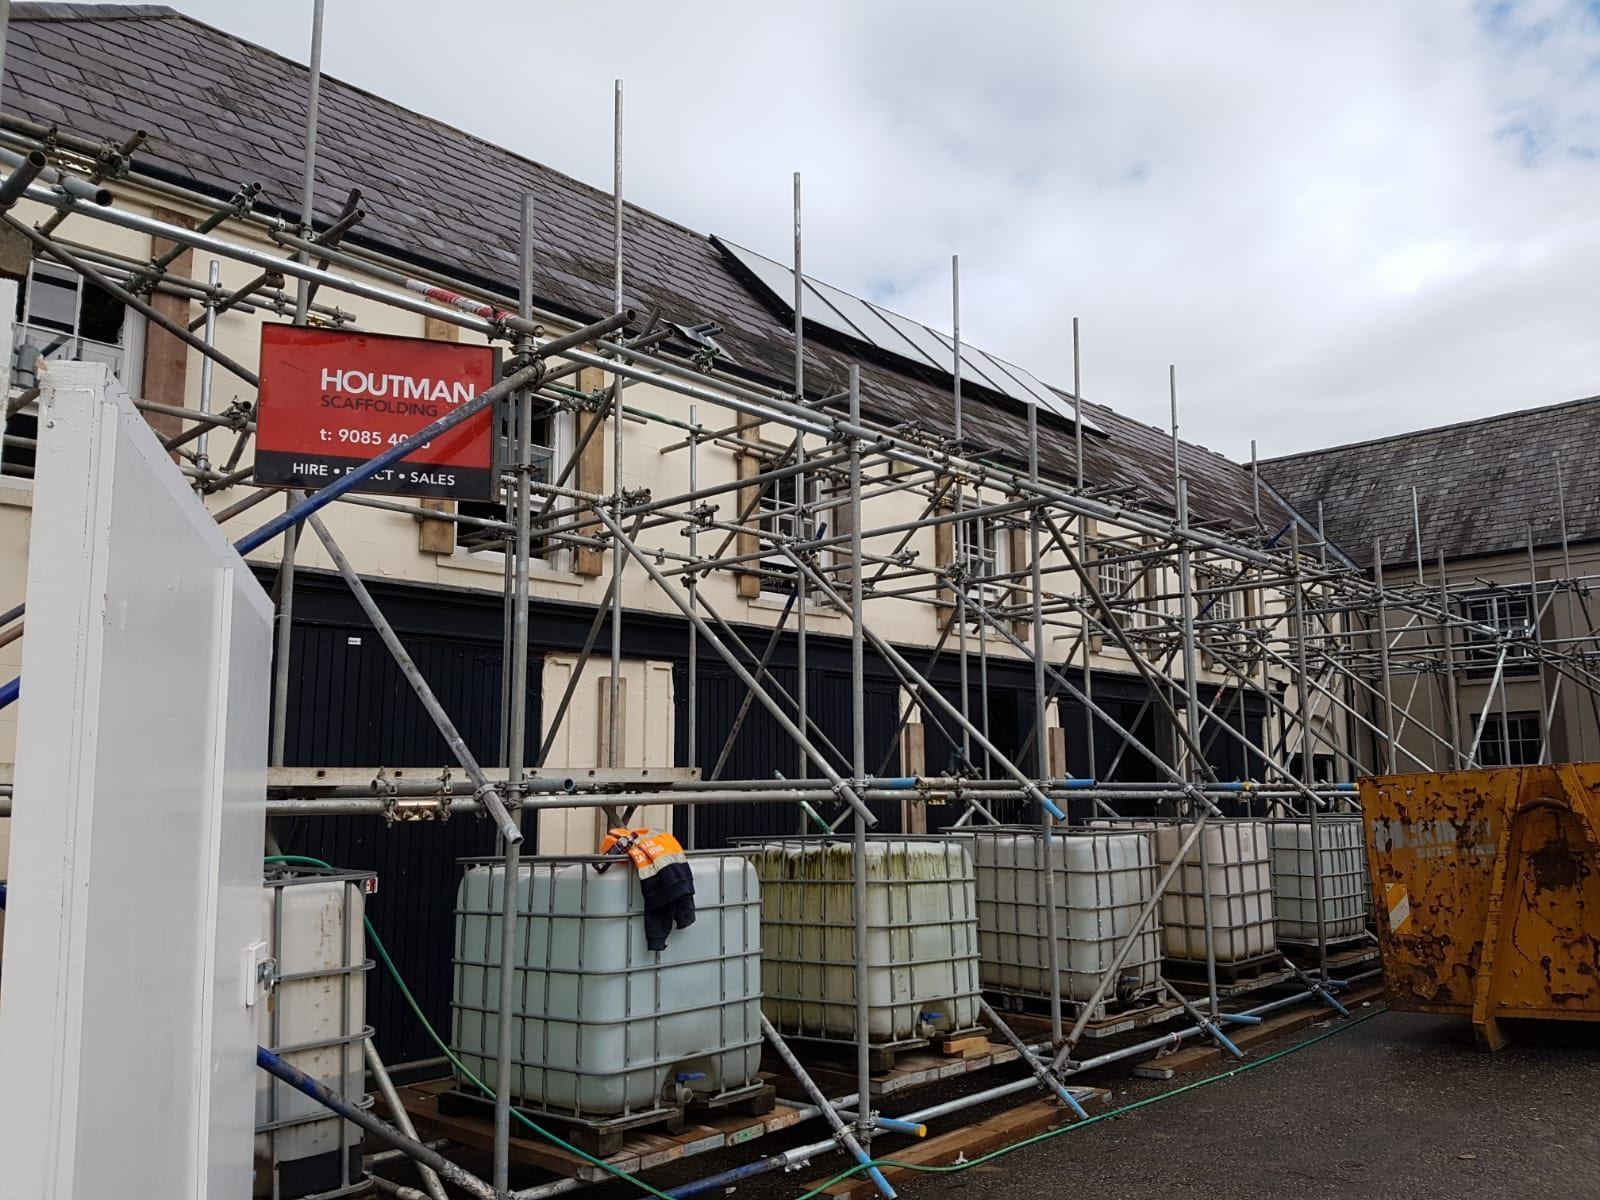 hillsborough castle facade retention Featured Image